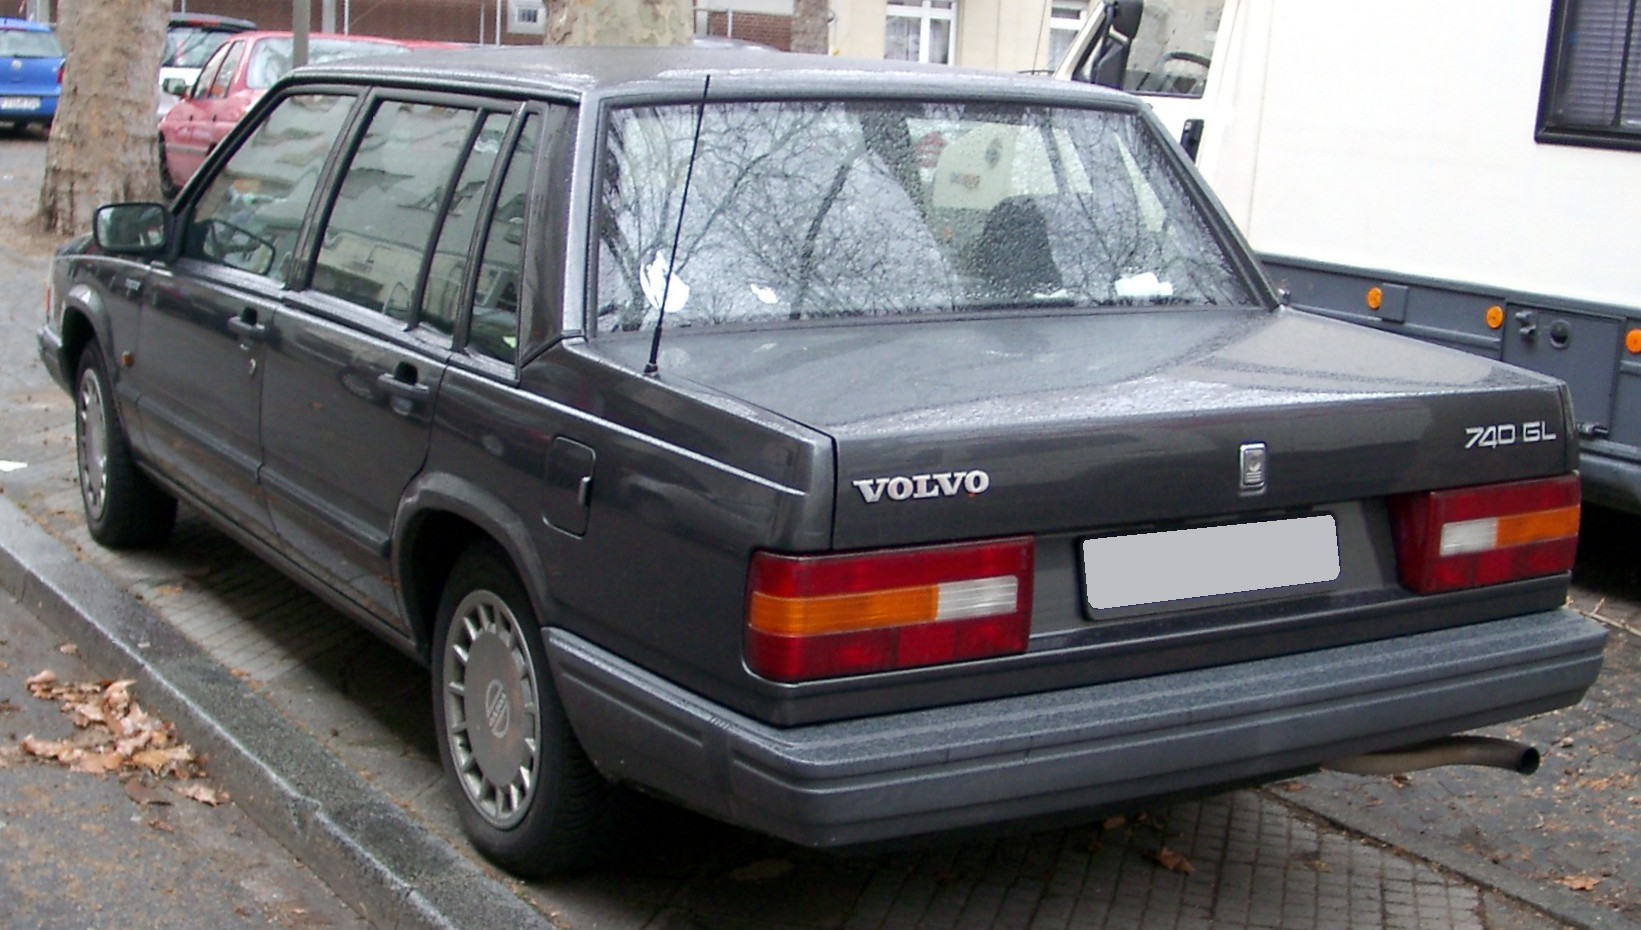 file volvo 740 rear 20080320 jpg wikimedia commons rh commons wikimedia org 1991 Volvo 760 1991 Volvo 740 Interior